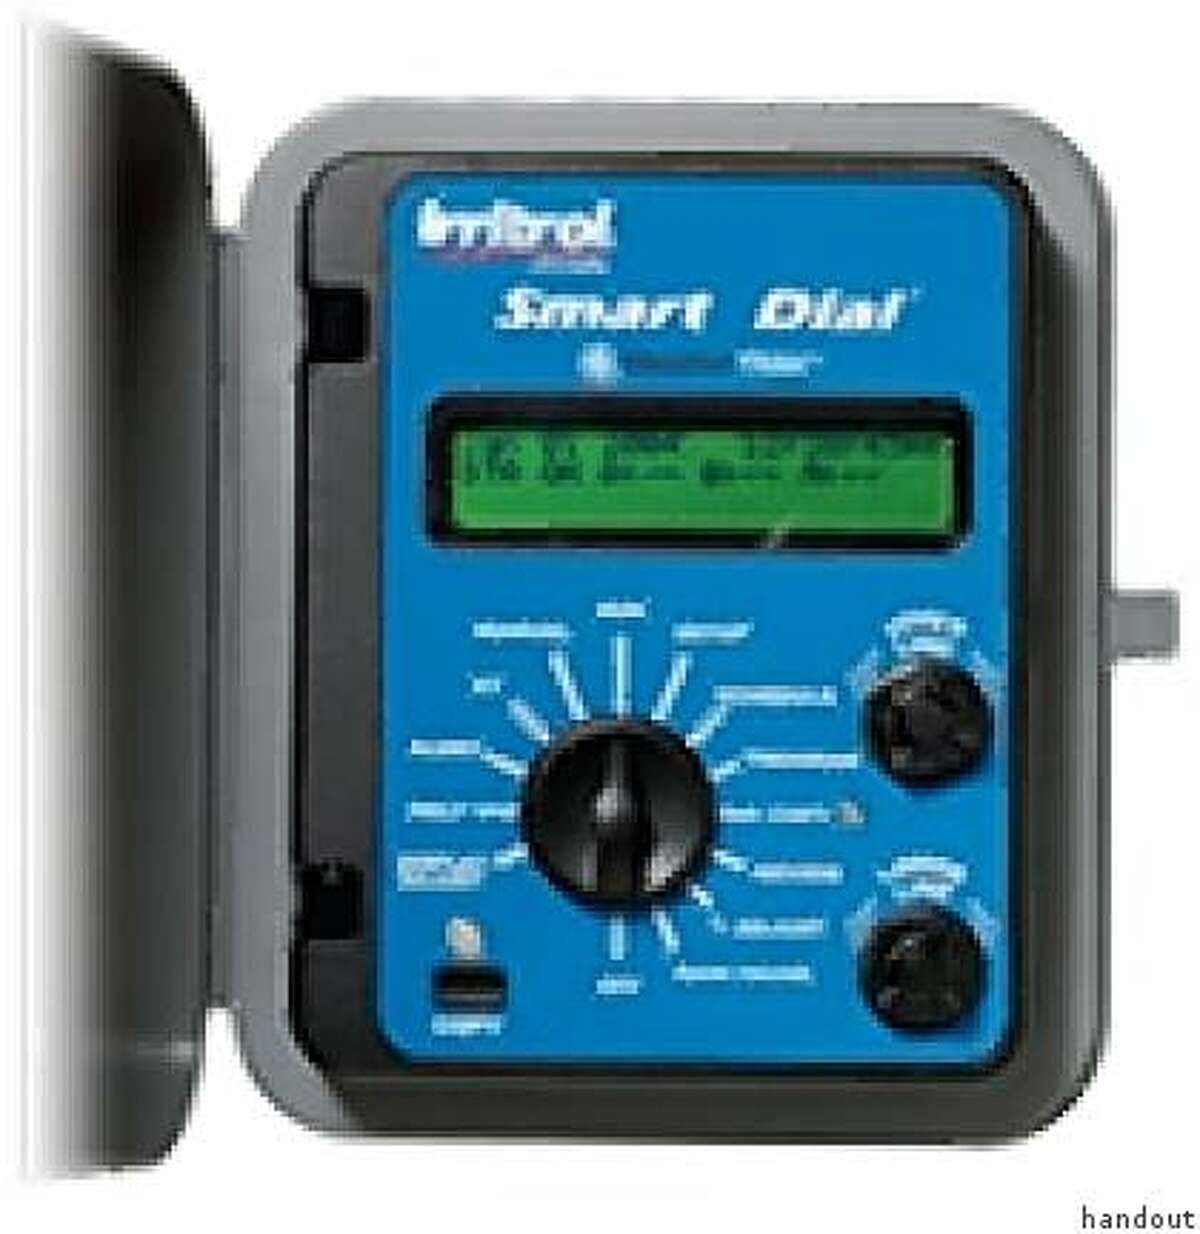 Irritrol brand water controller